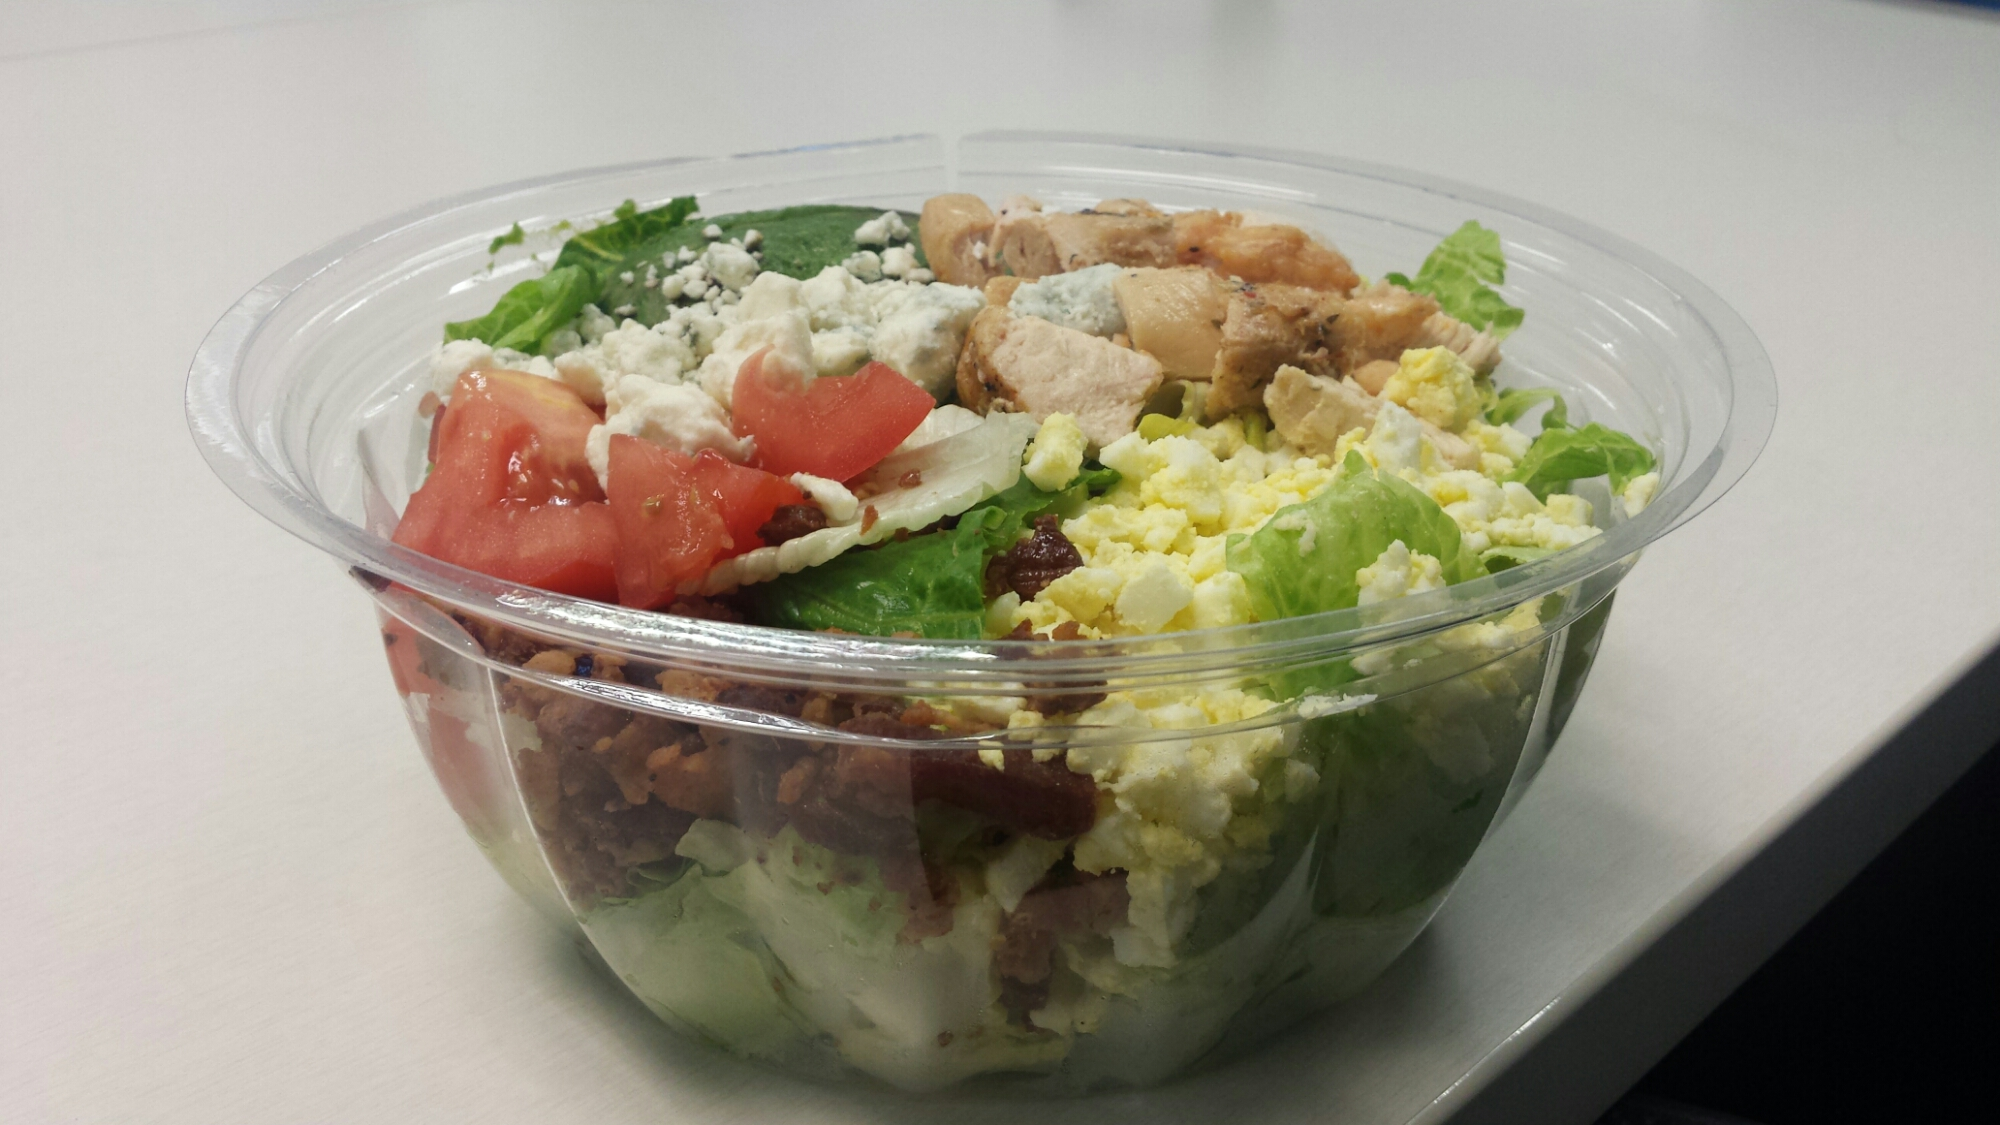 Cobb Salad - bacon, avocado, boiled eggs,blue cheese, tomatoes